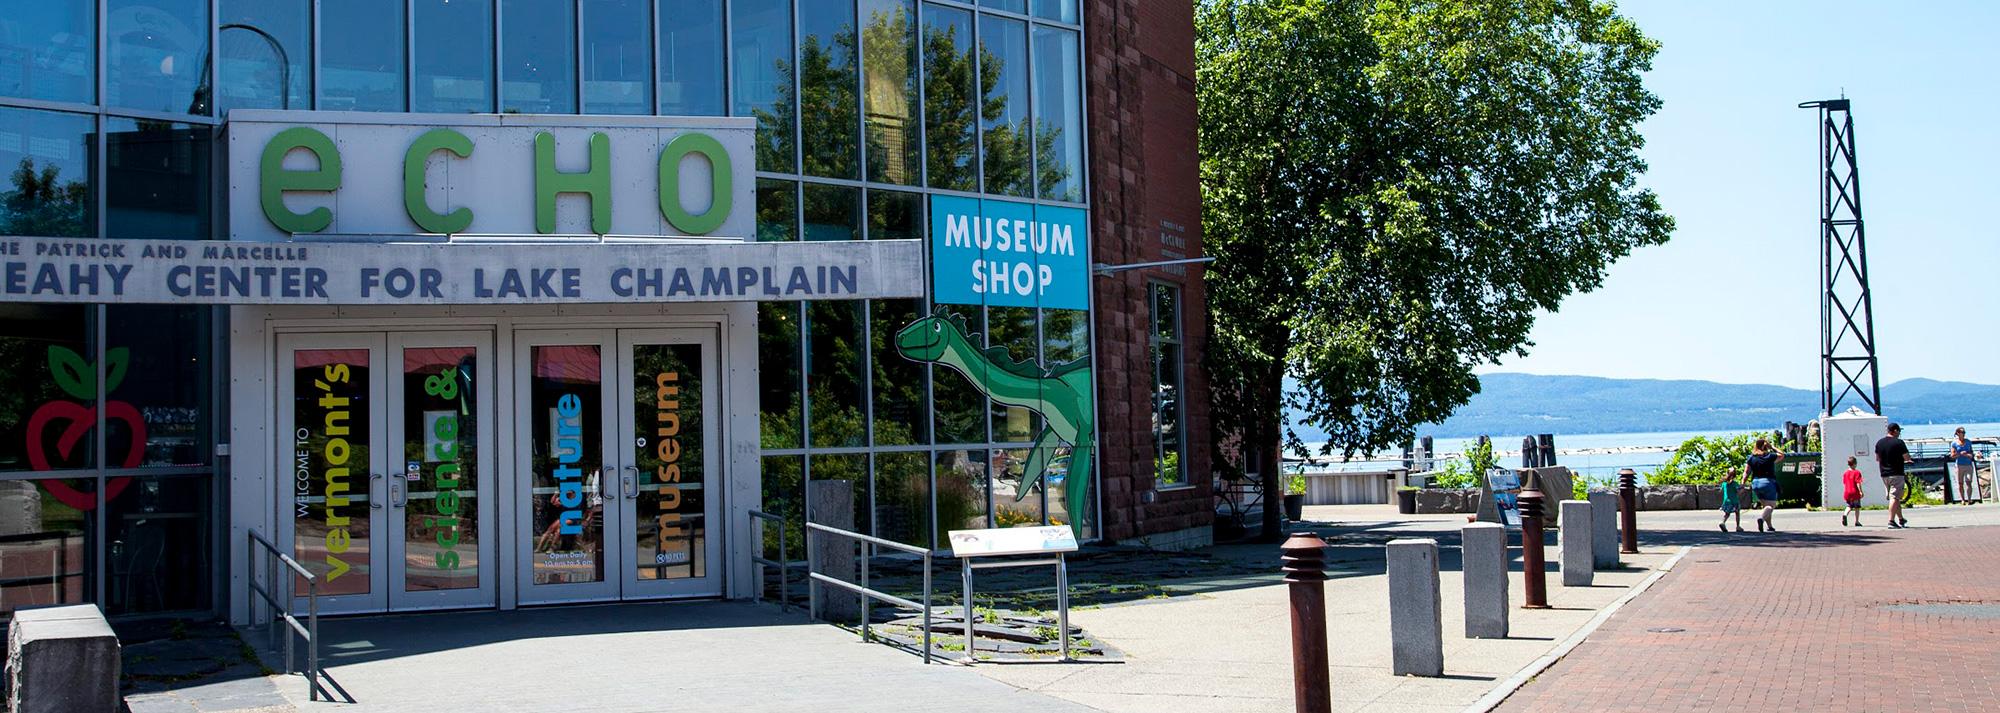 ECHO_museumshop